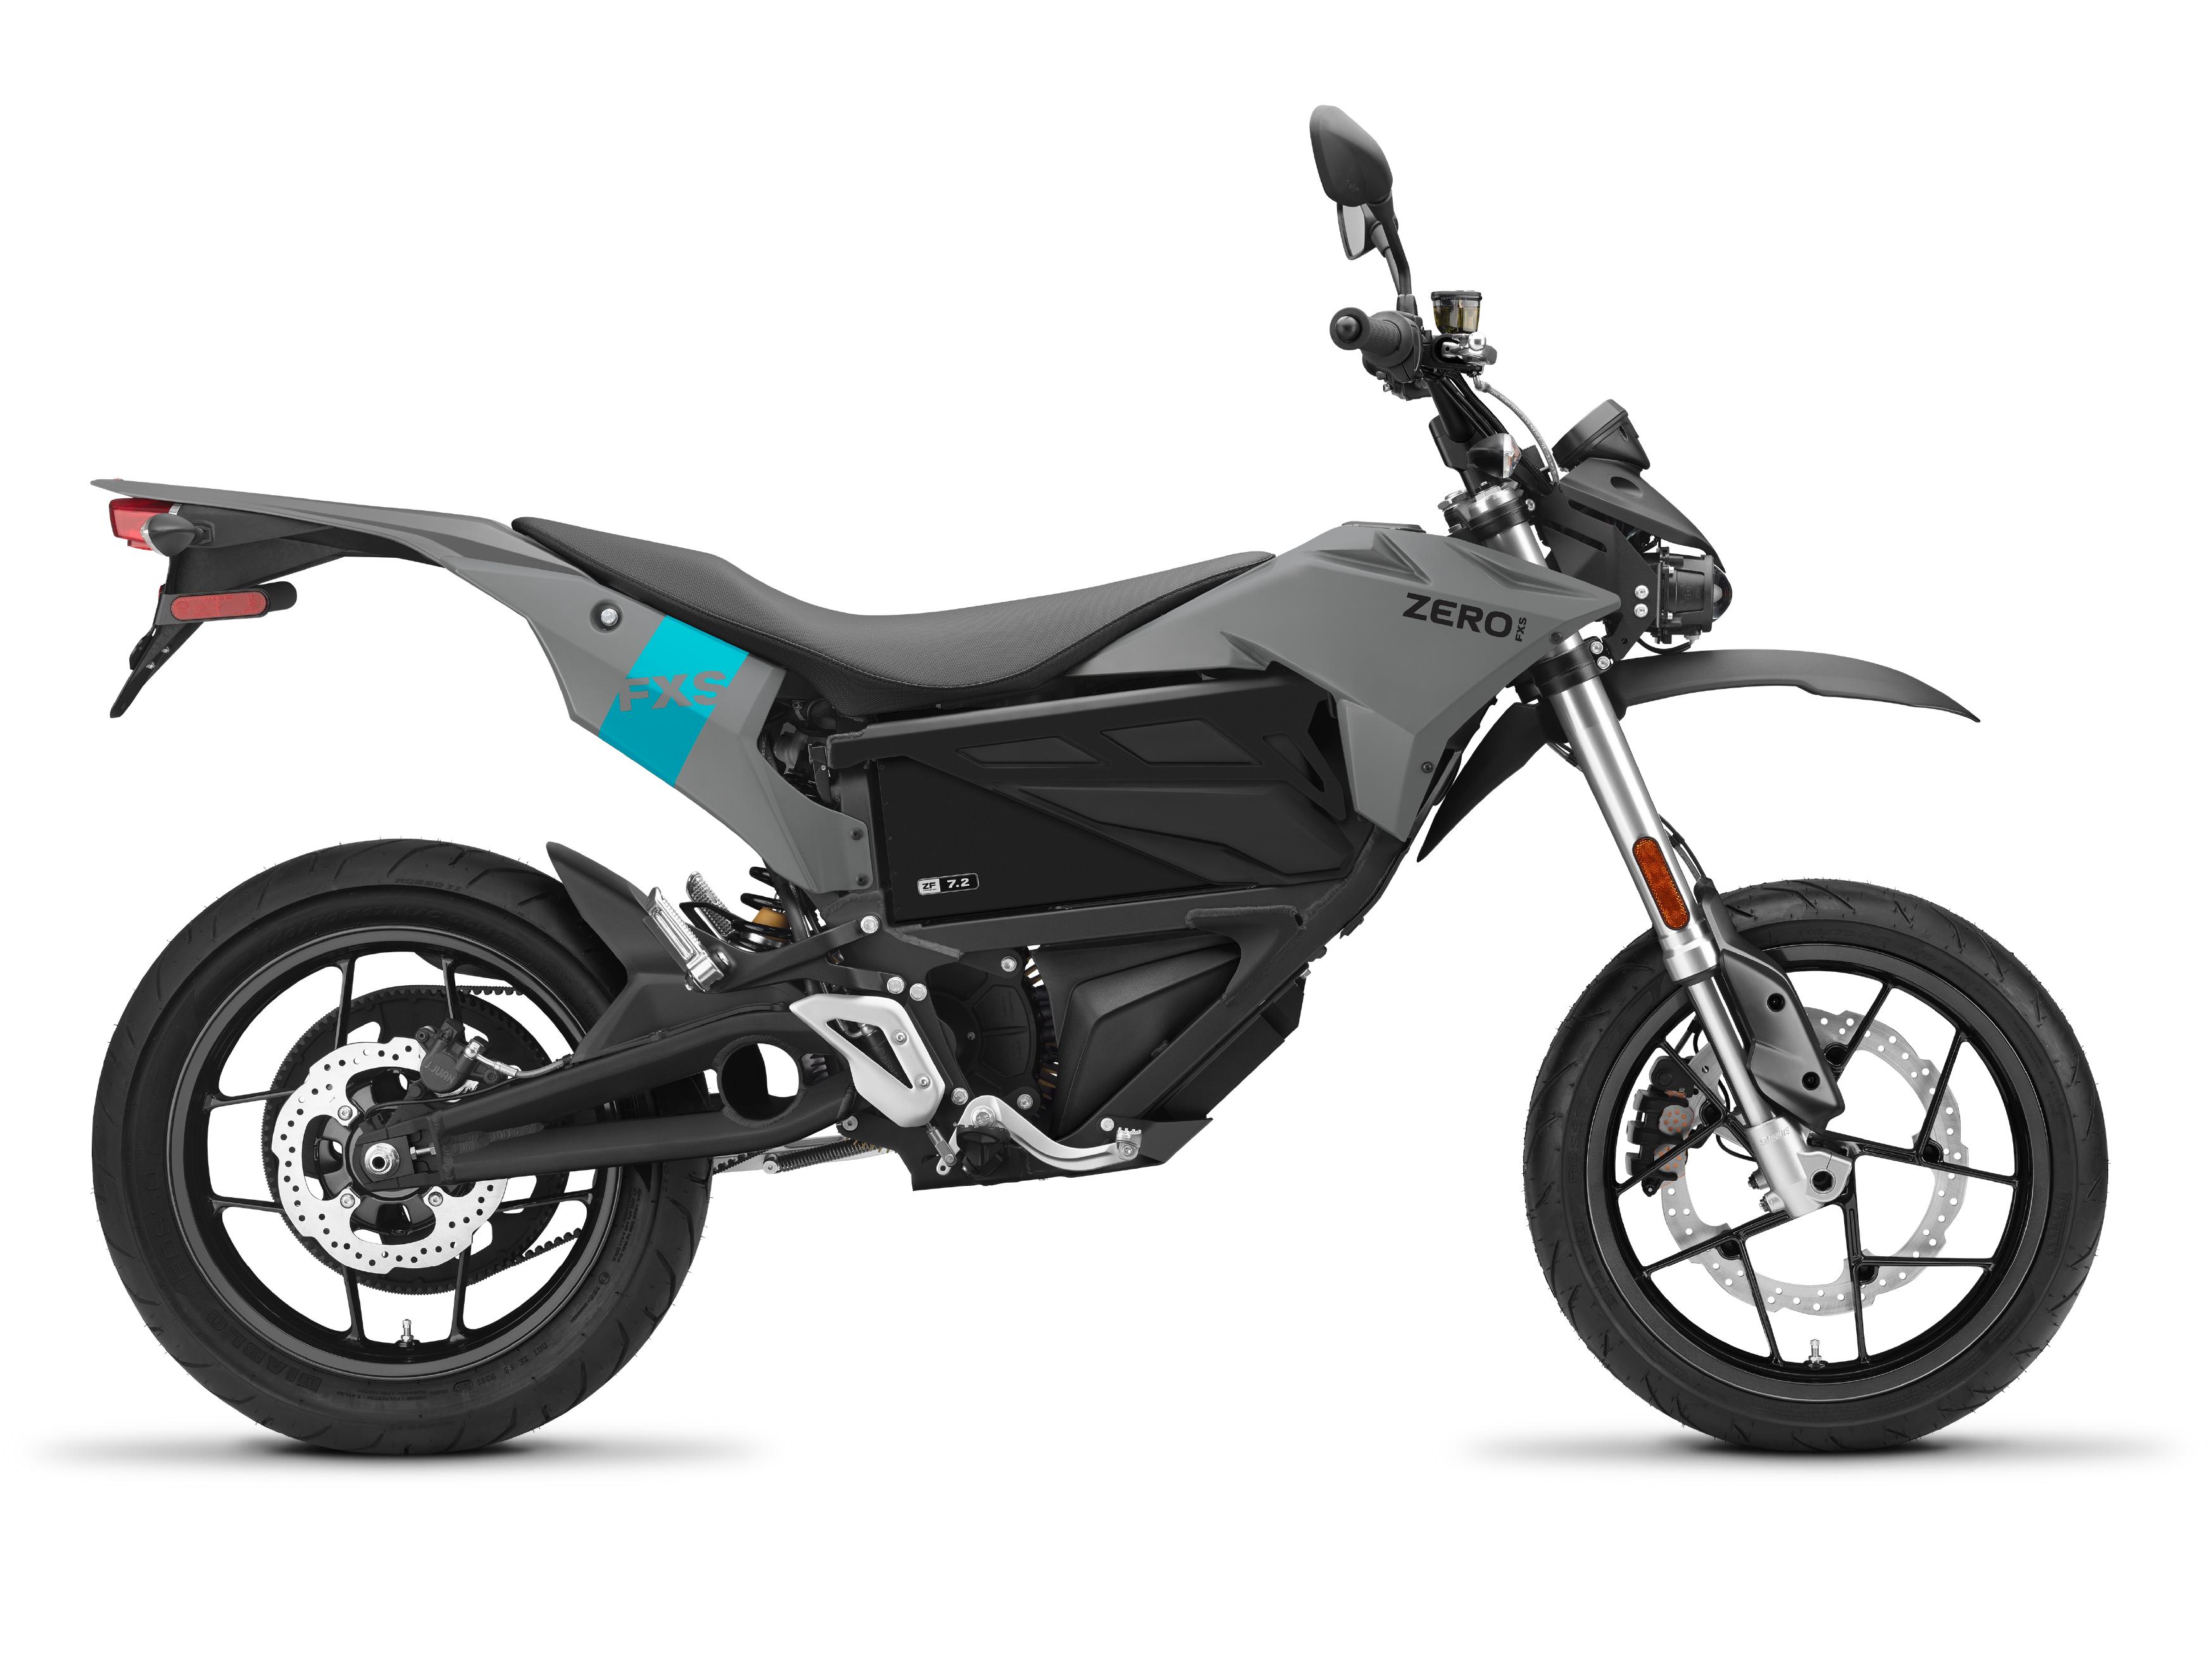 Zero FXS ZF 7.2 E-Motor